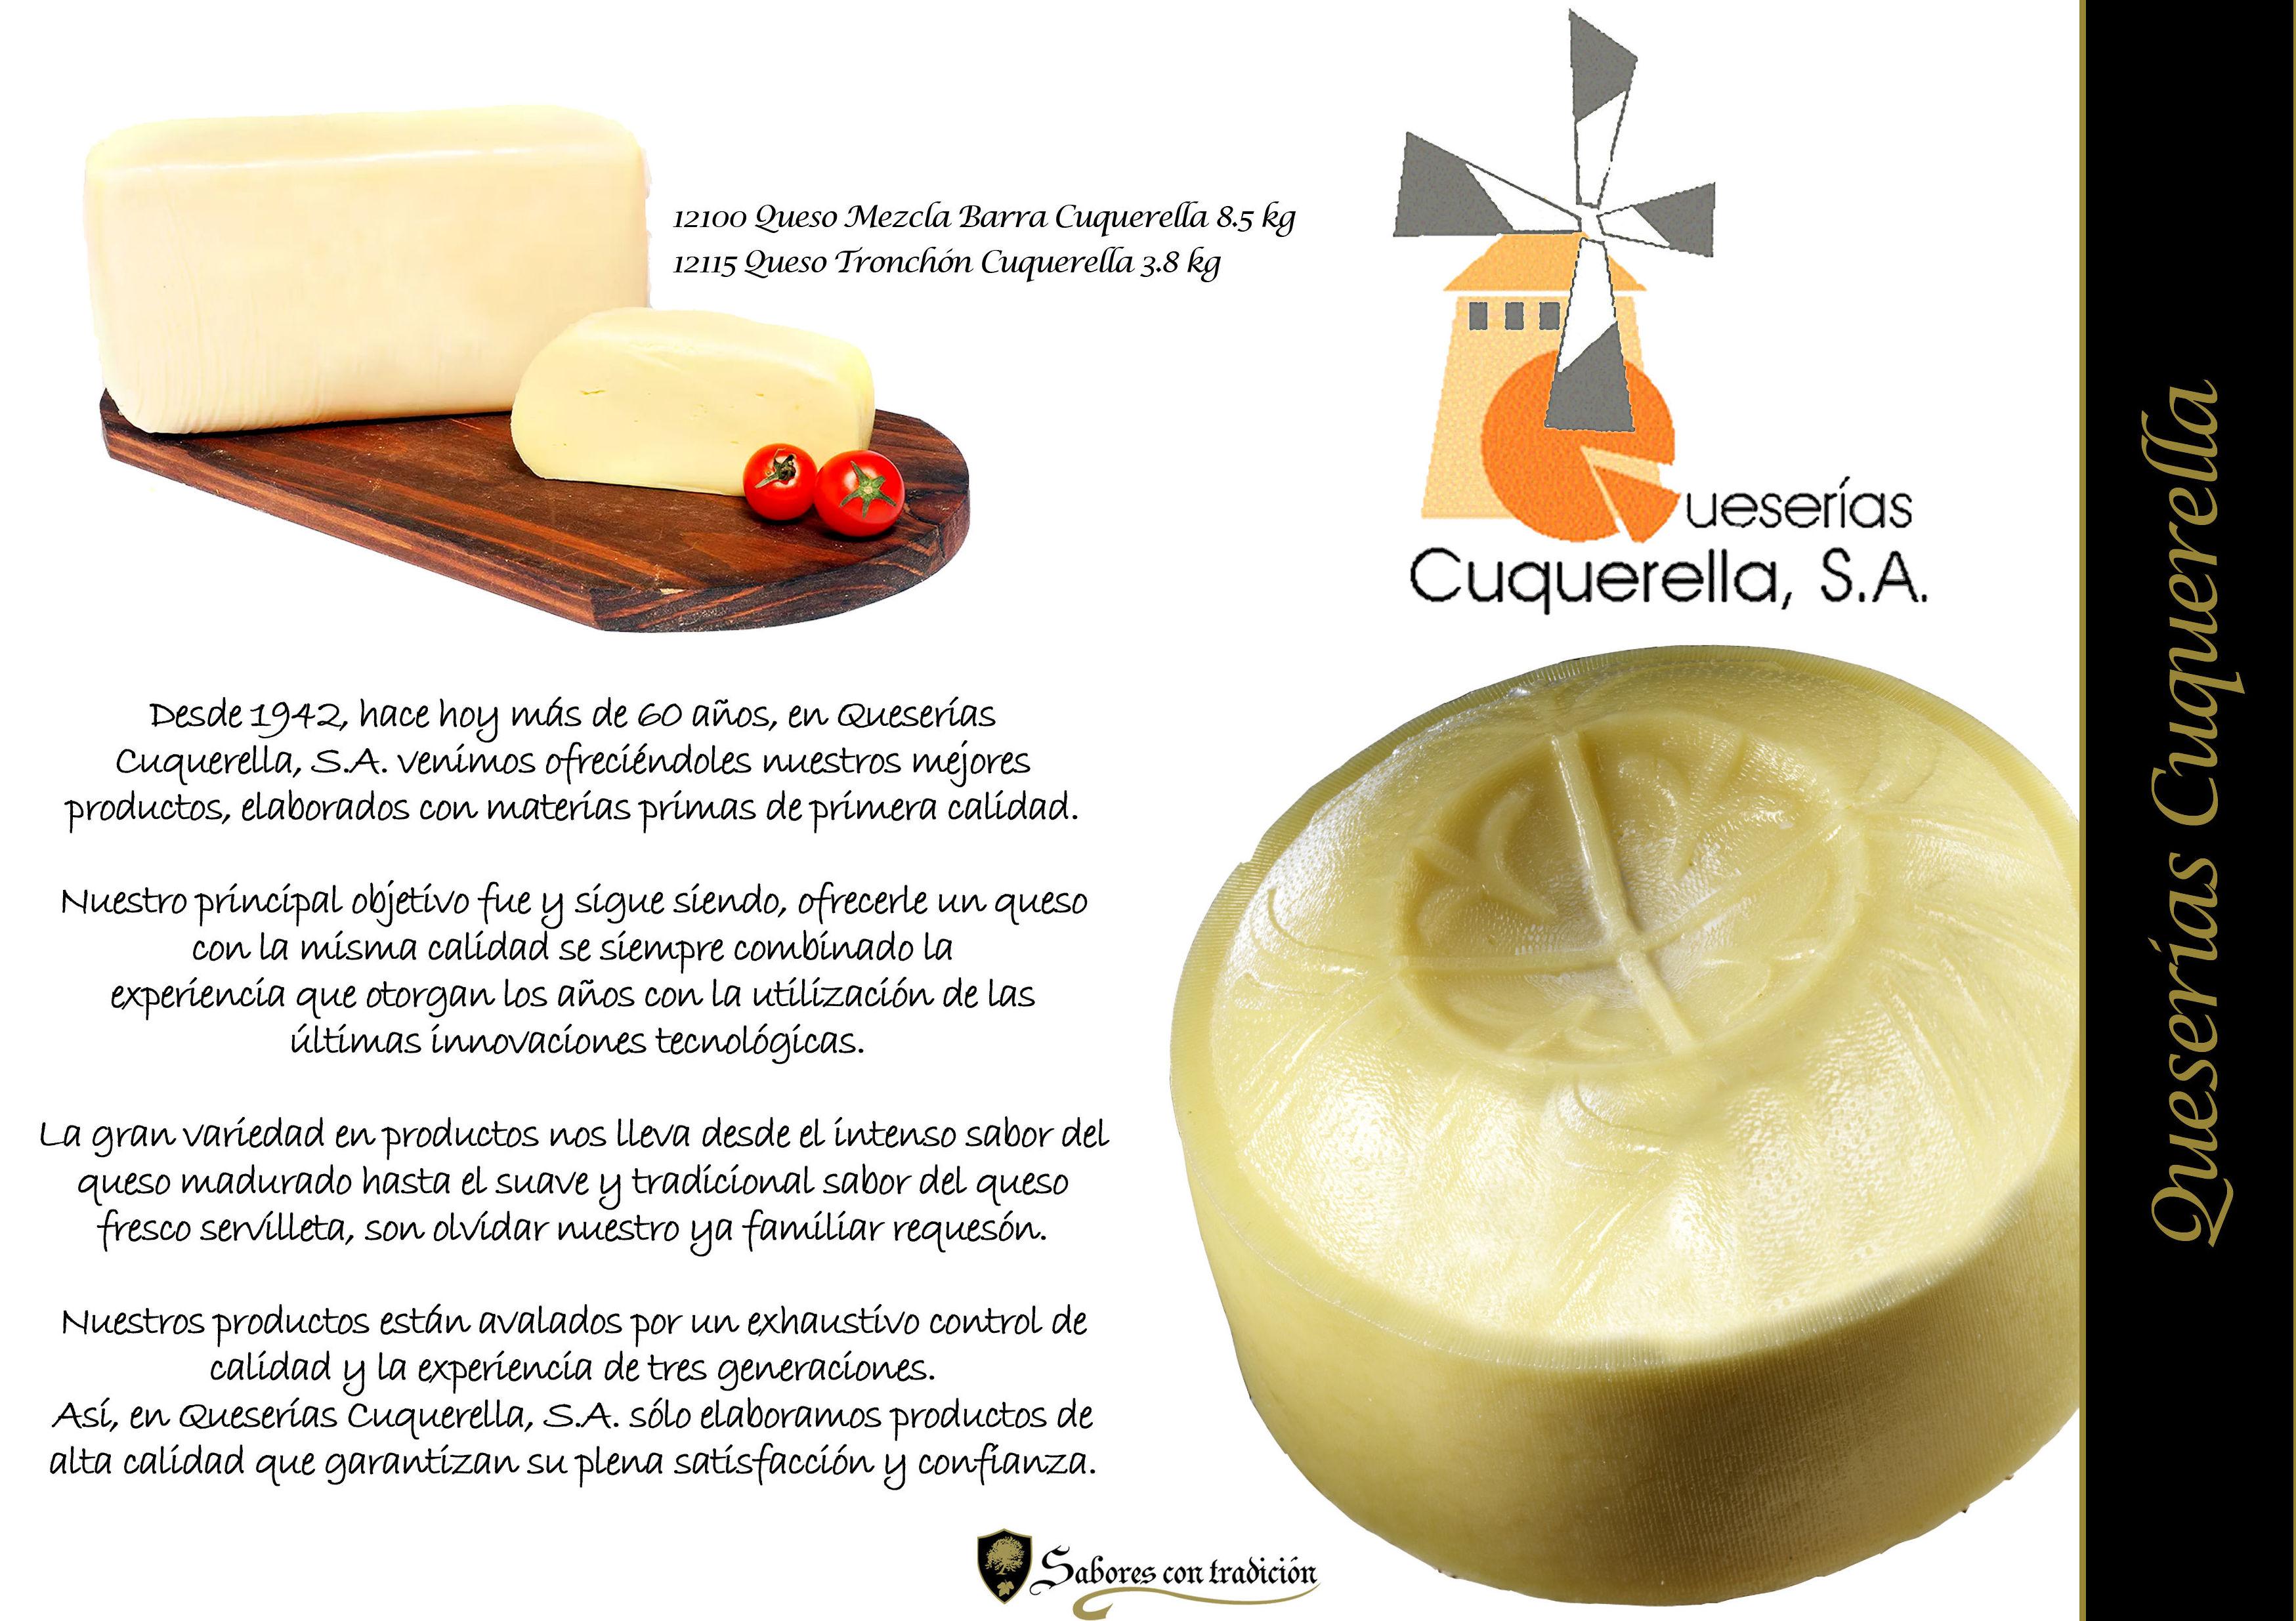 "Quesos "" Queseria Cuquerella "": Productos de Sabores con tradición"